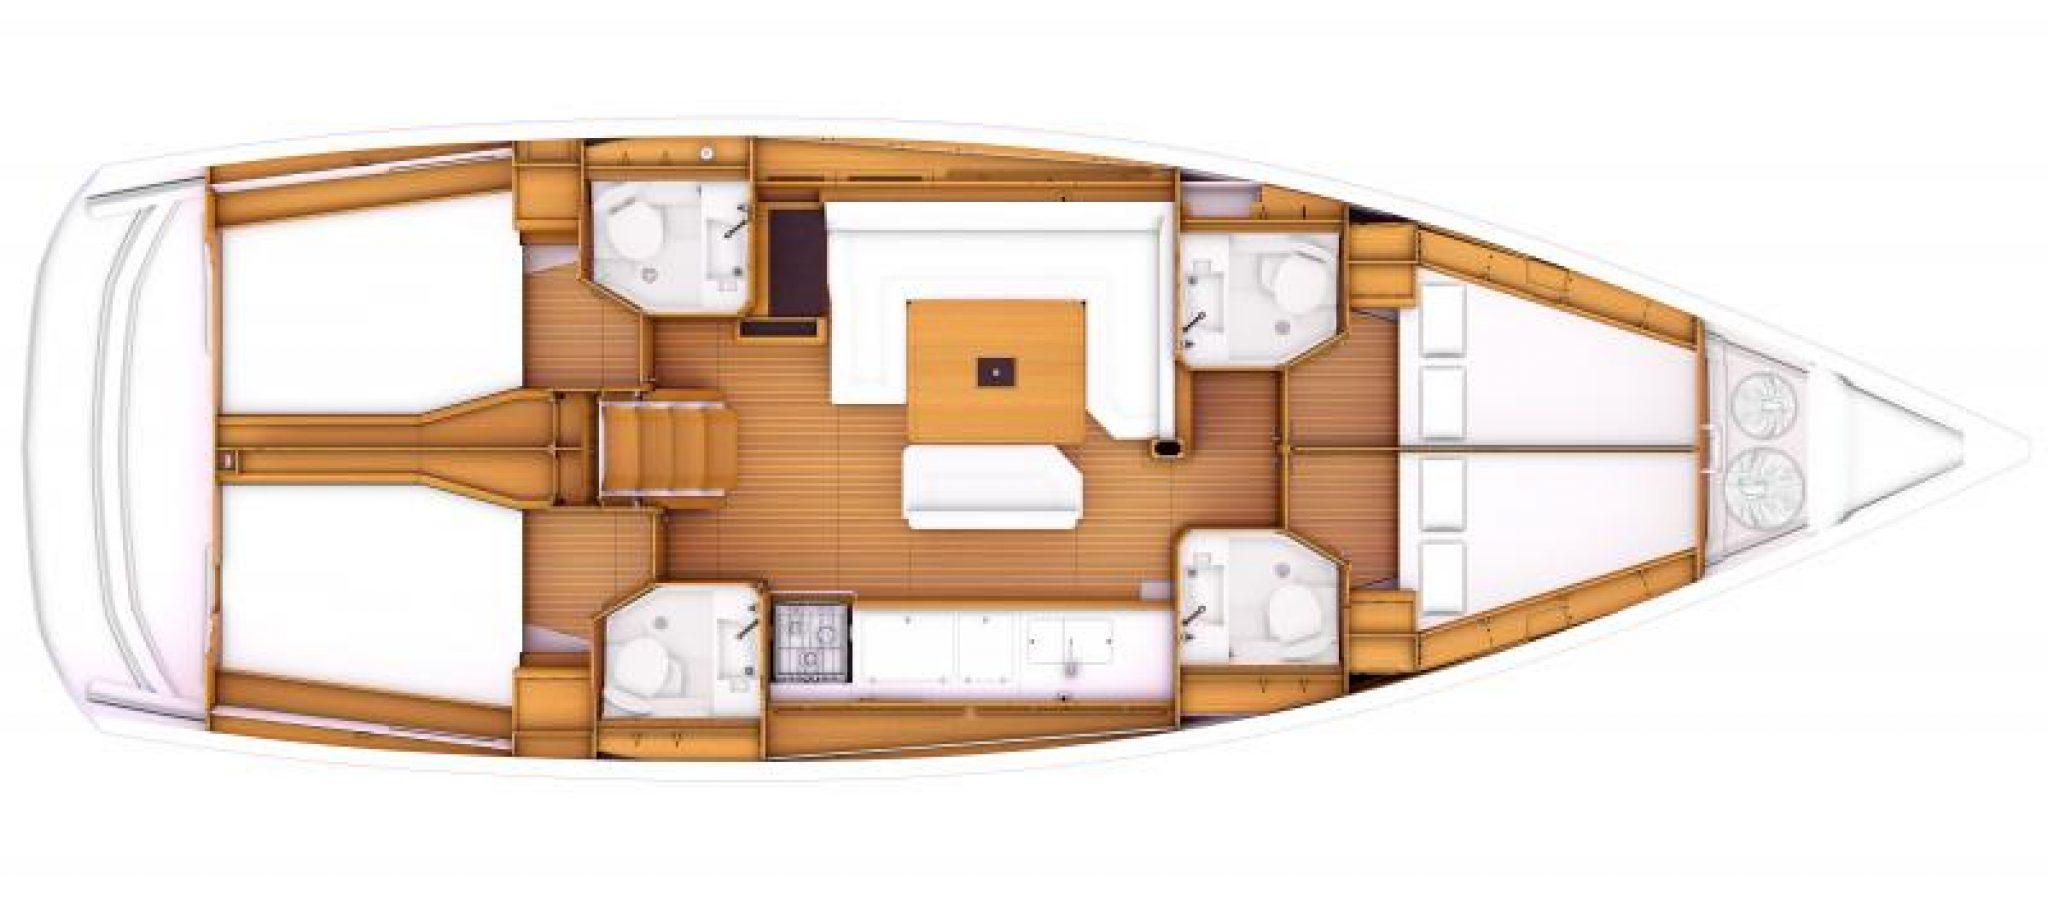 Sun Odyssey 469 plan 4 cabines